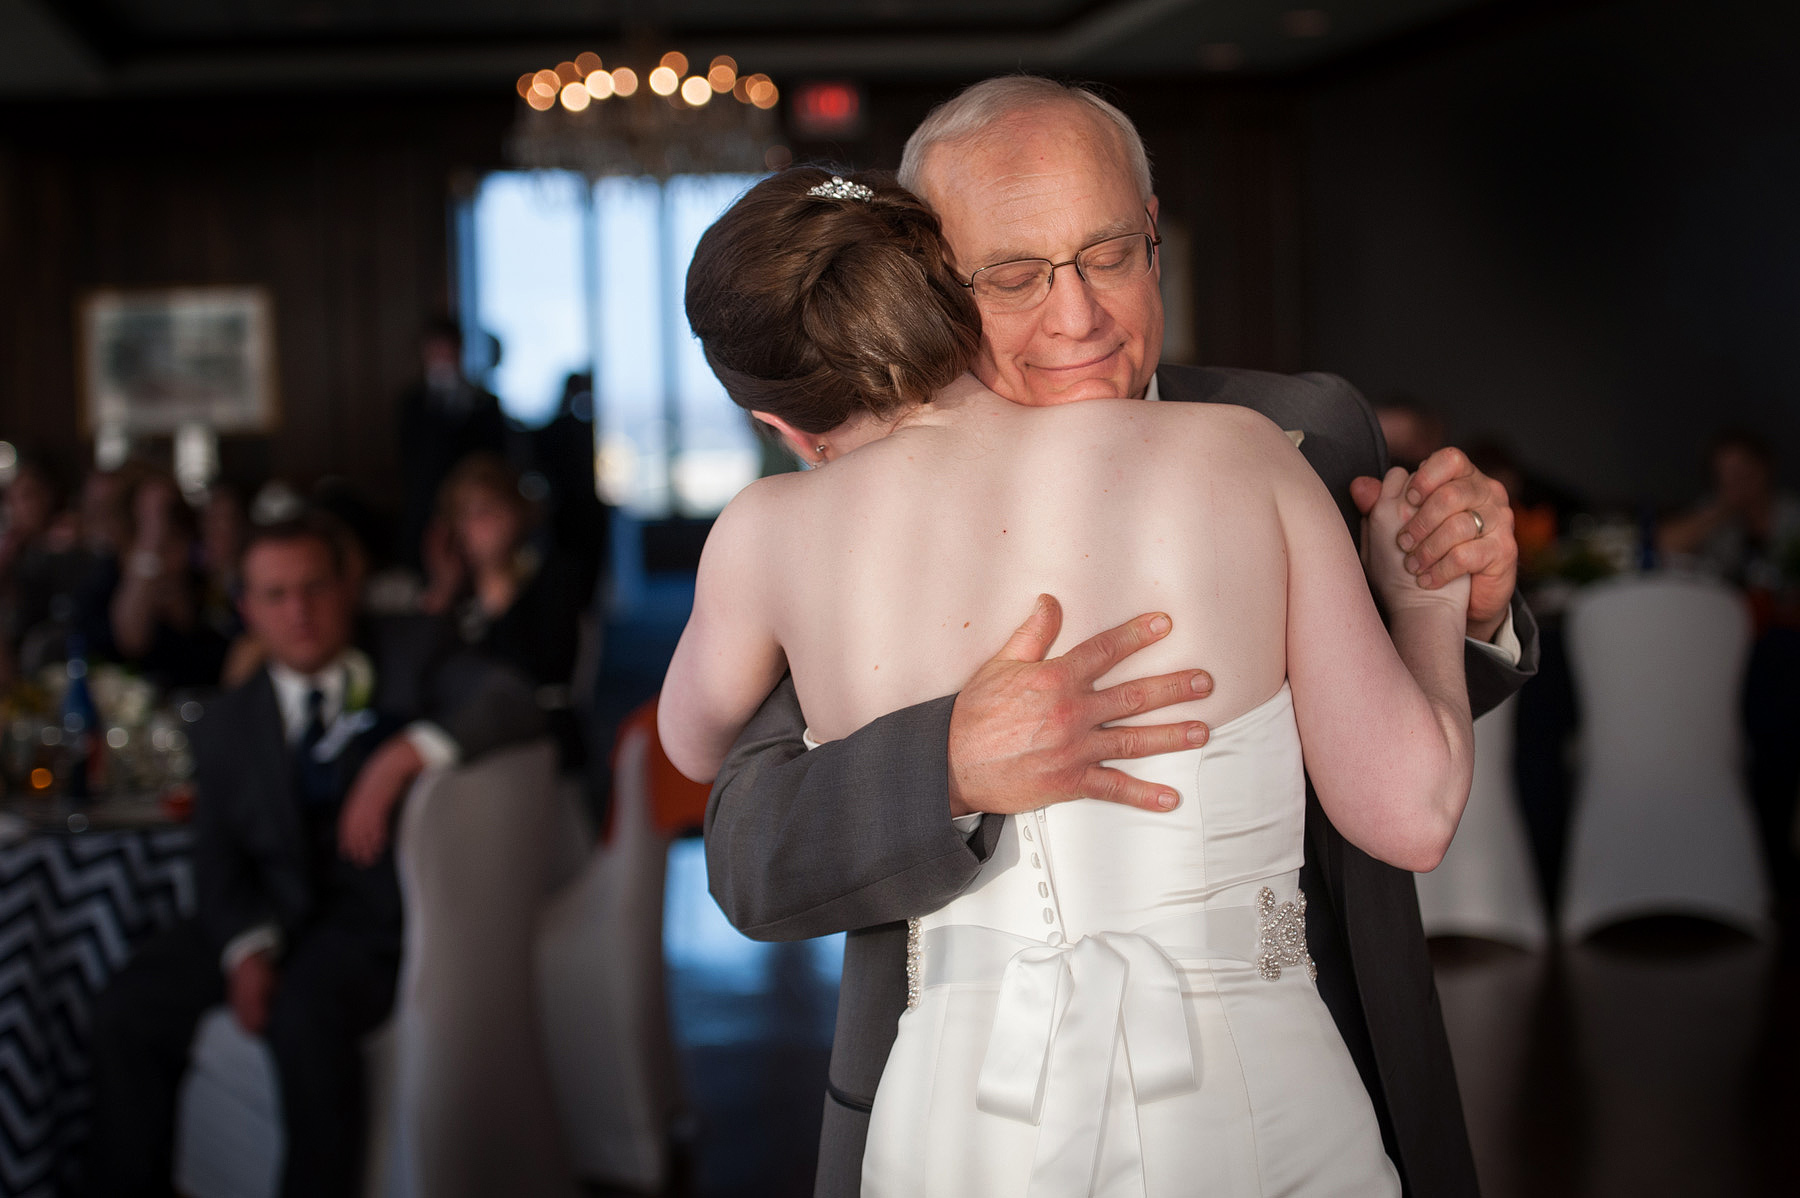 wedding-photography-saint-paul-mark-kegans-601.jpg